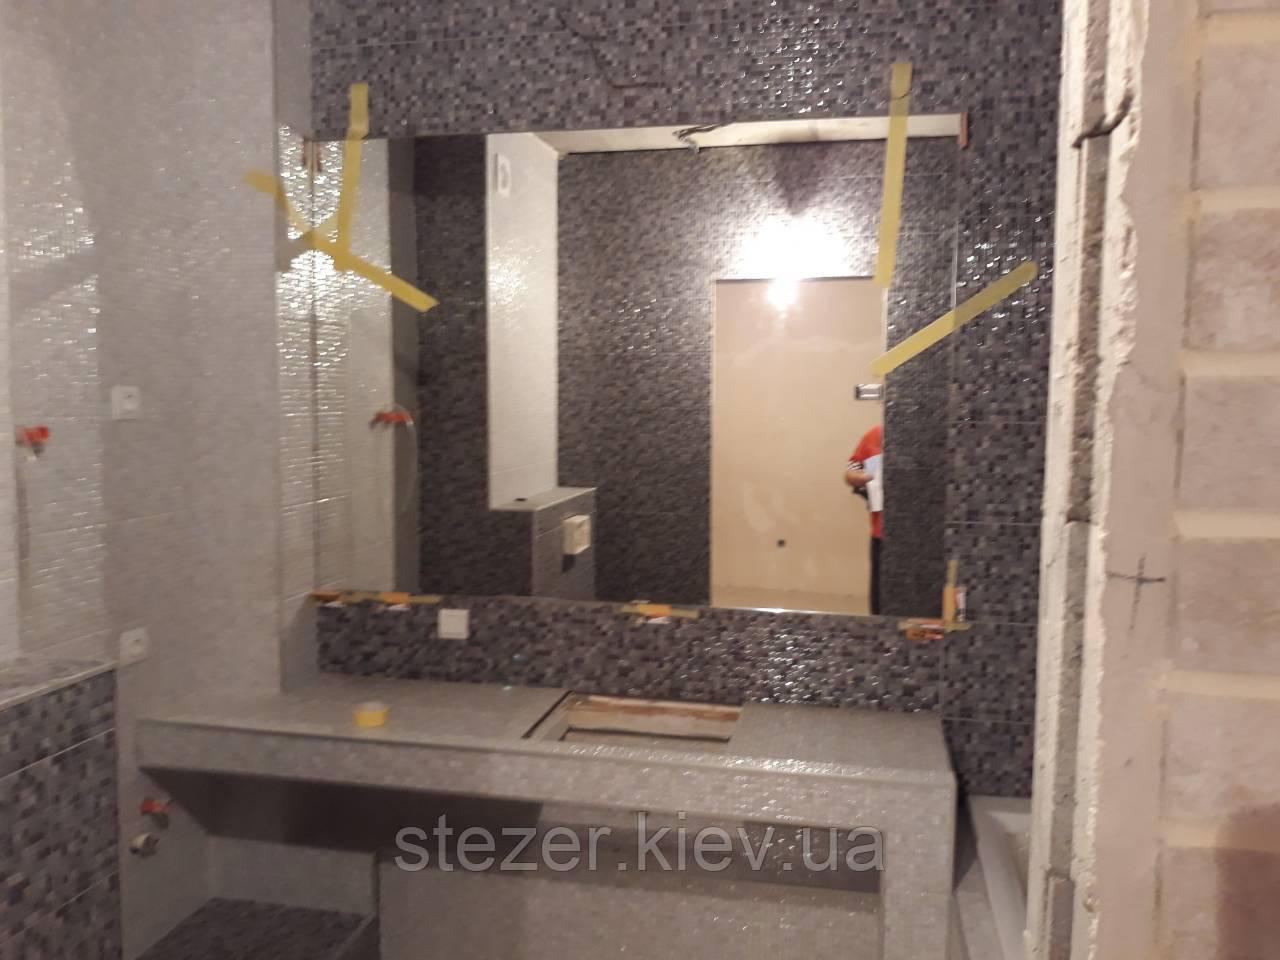 Зеркало для ванной 120х90х0,4 см